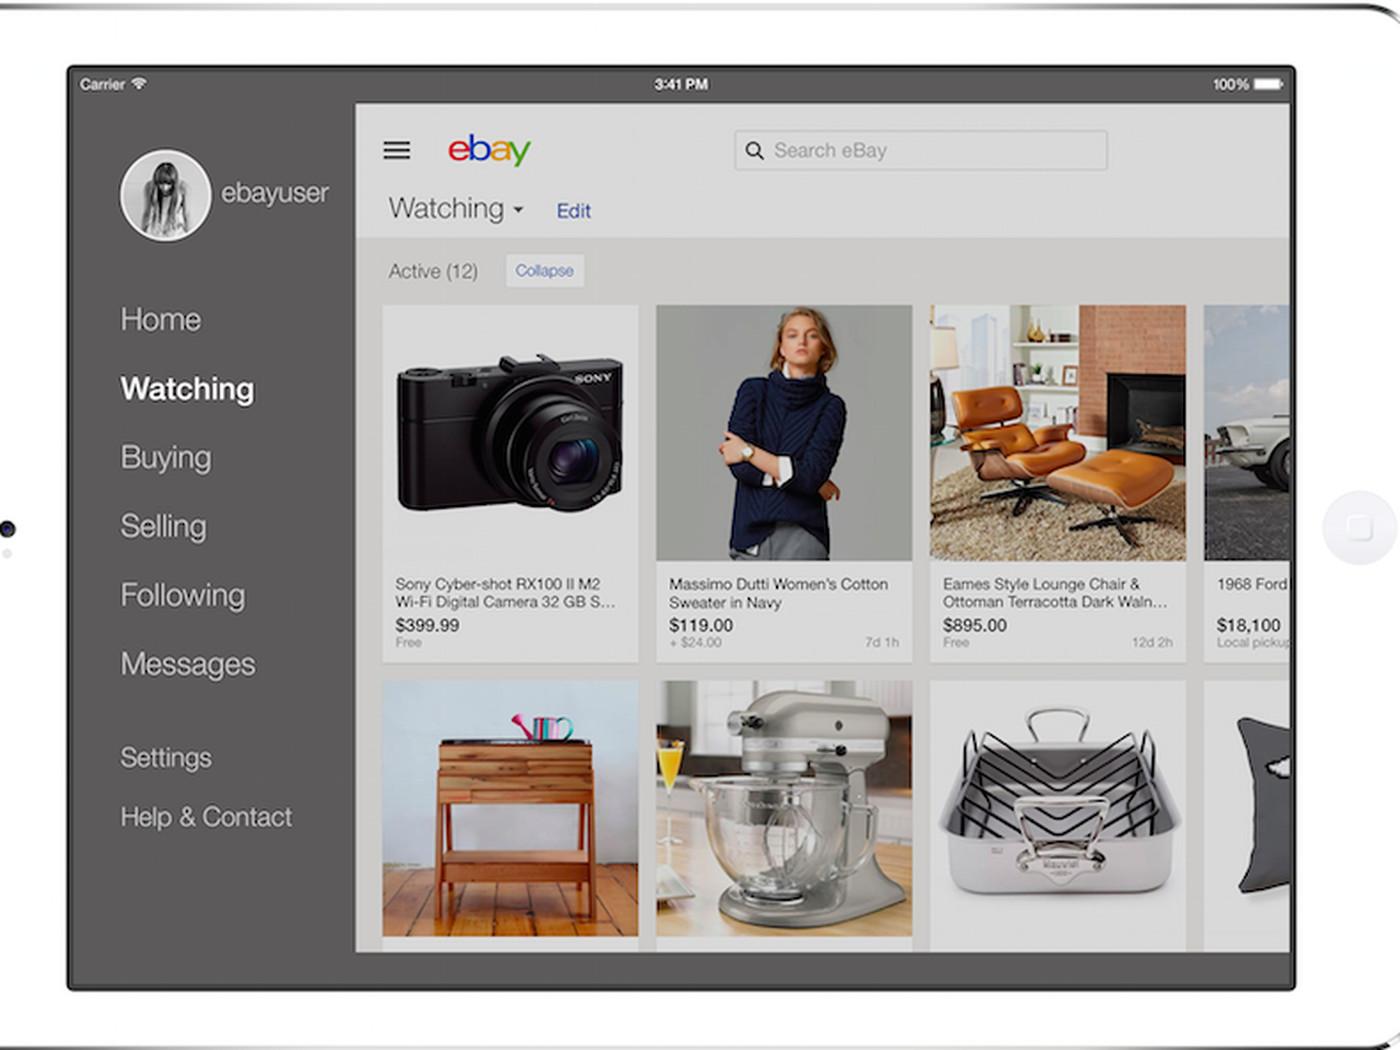 Ebay Overhauls Ipad App To Look More Like Pinterest And Less Like Amazon Vox